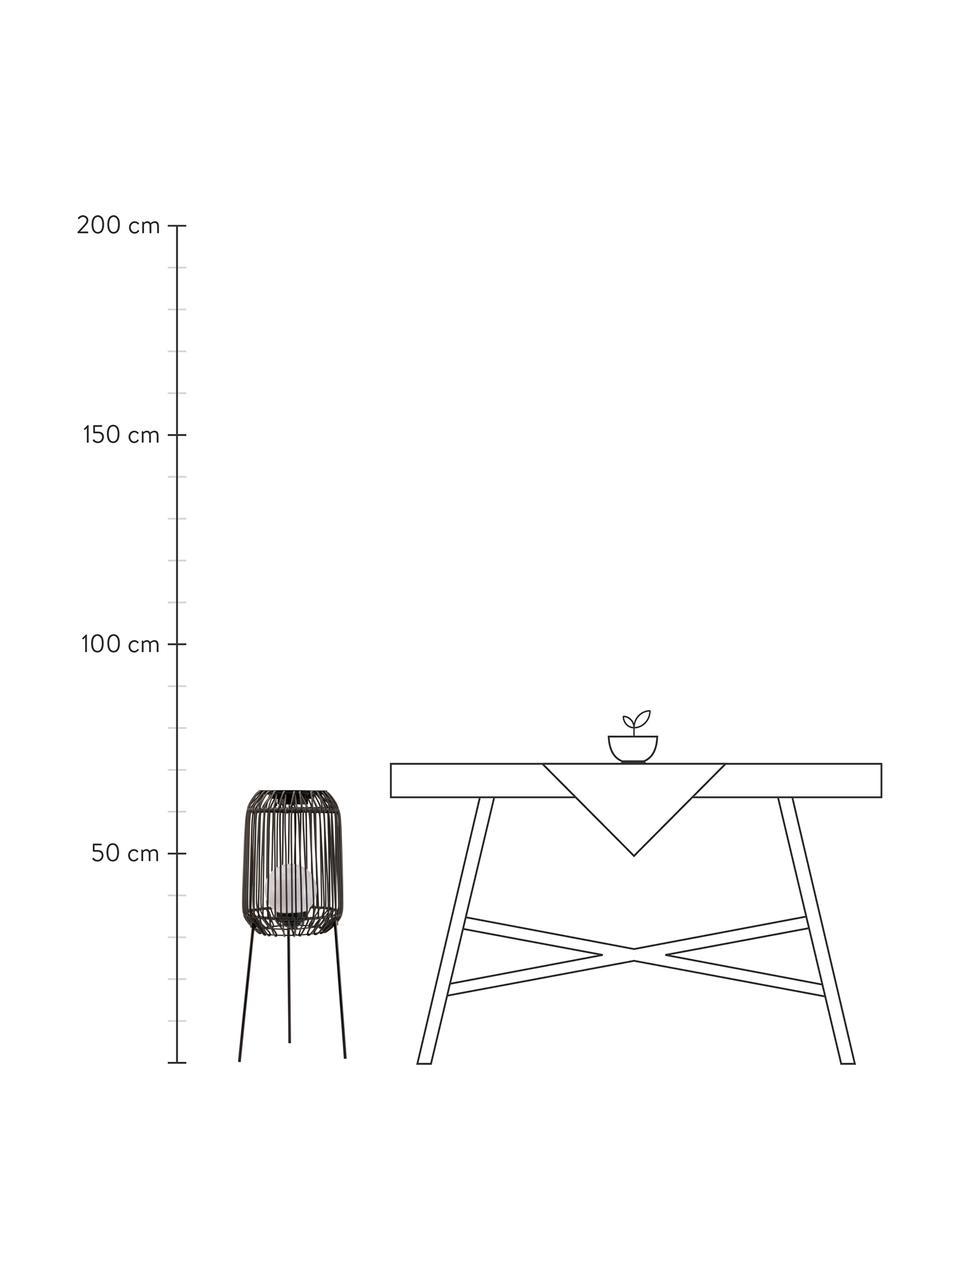 Mobile Solar Bodenleuchte Sunshine Coziness, Lampenschirm: Polyrattan, Lampenfuß: Metall, beschichtet, Schwarz, Grau, Ø 28 cm